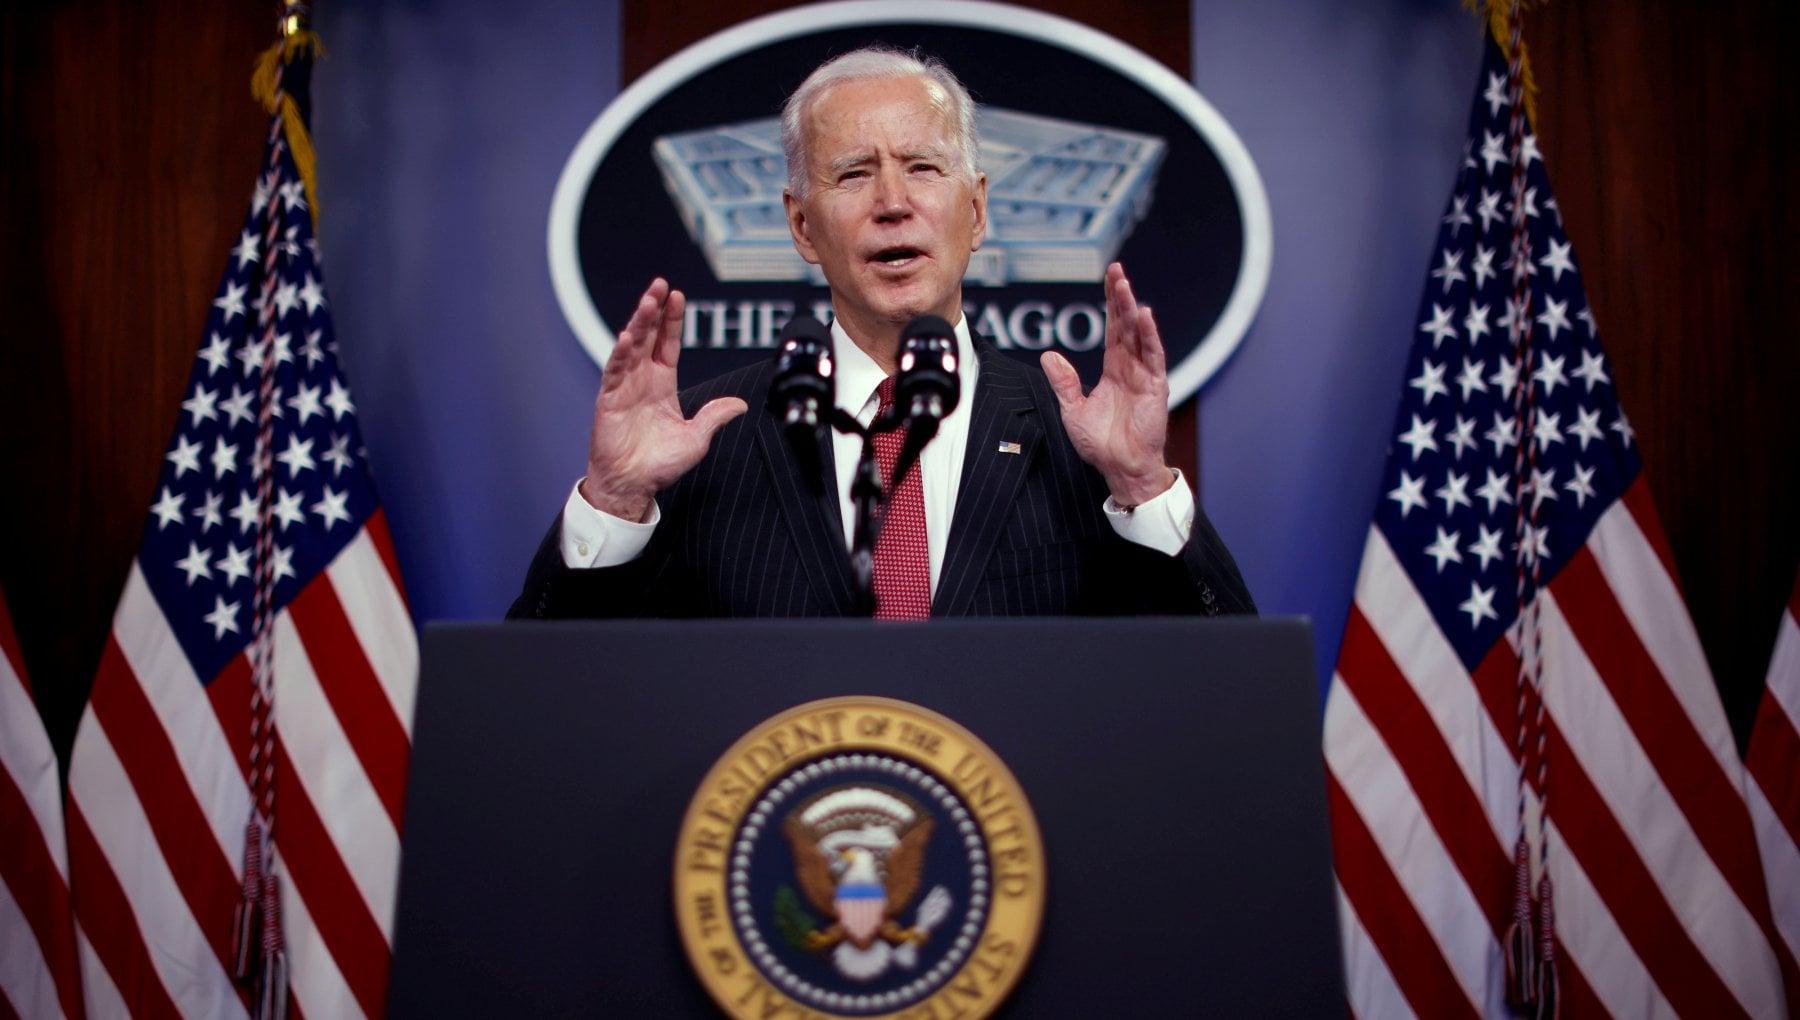 Attacco aereo Usa Siria Biden